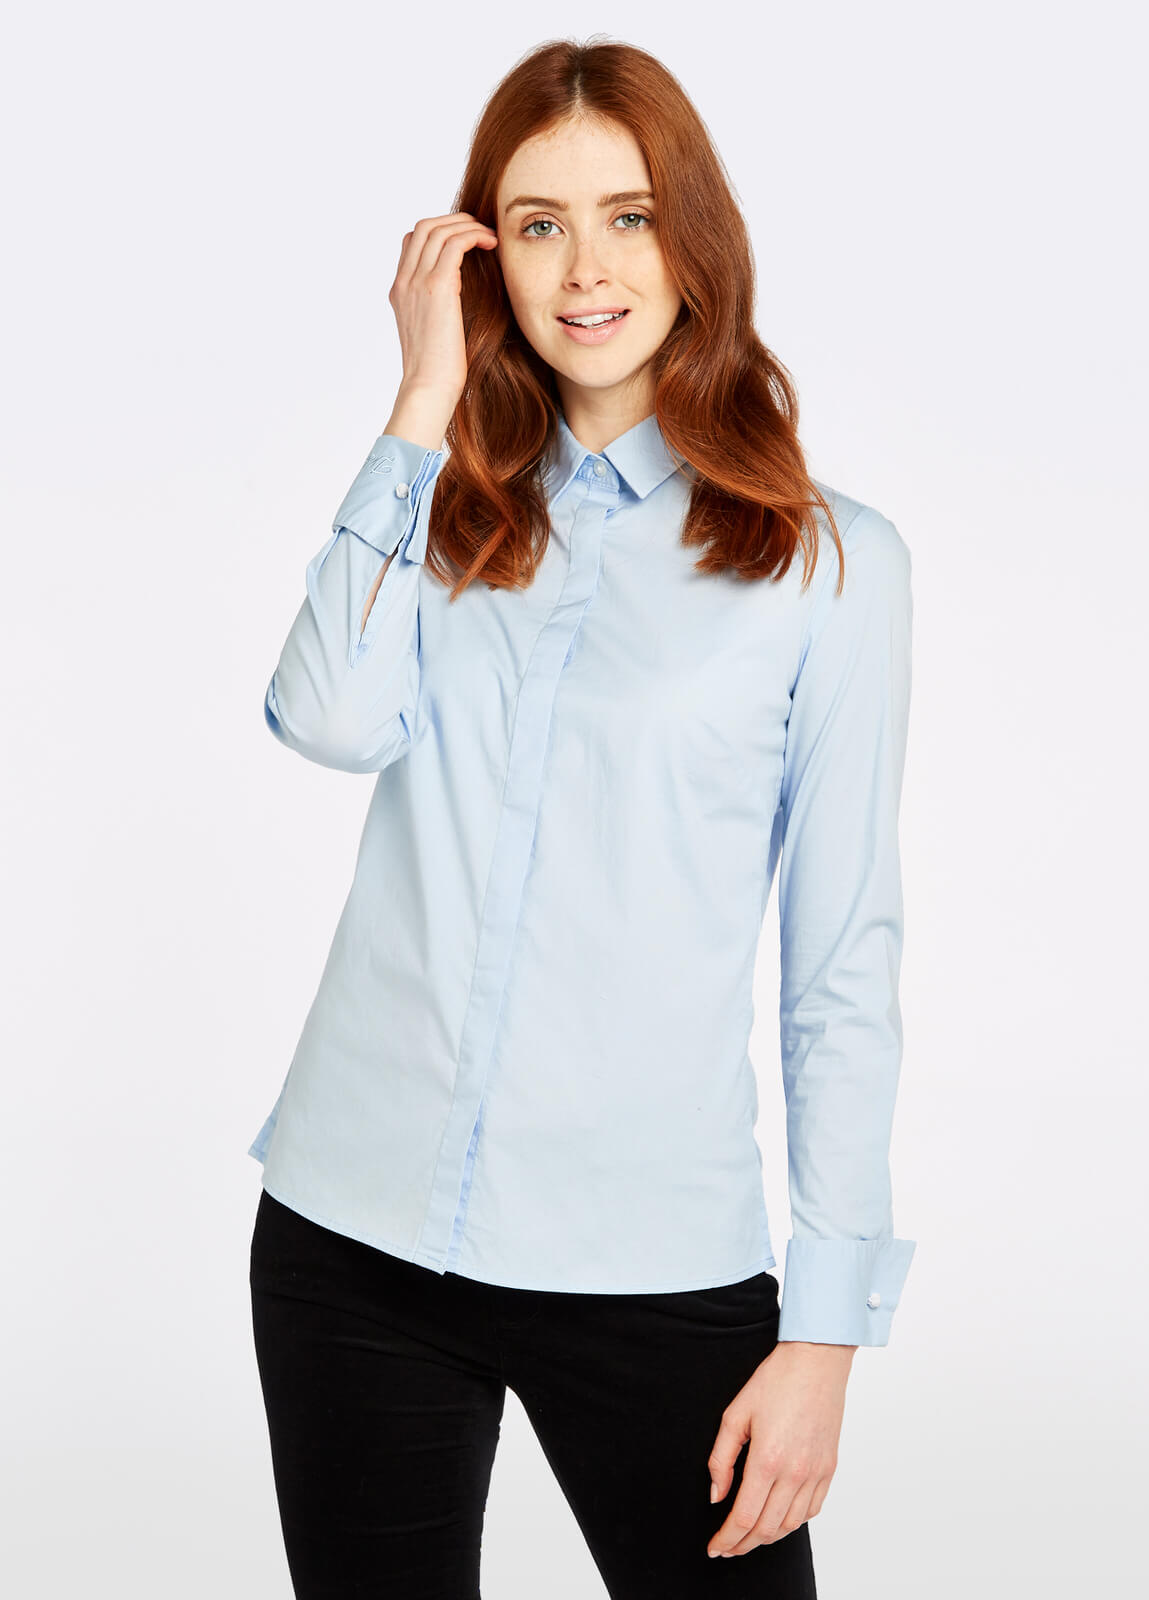 Dubarry_Daffodil_Shirt_Pale_Blue_on_model